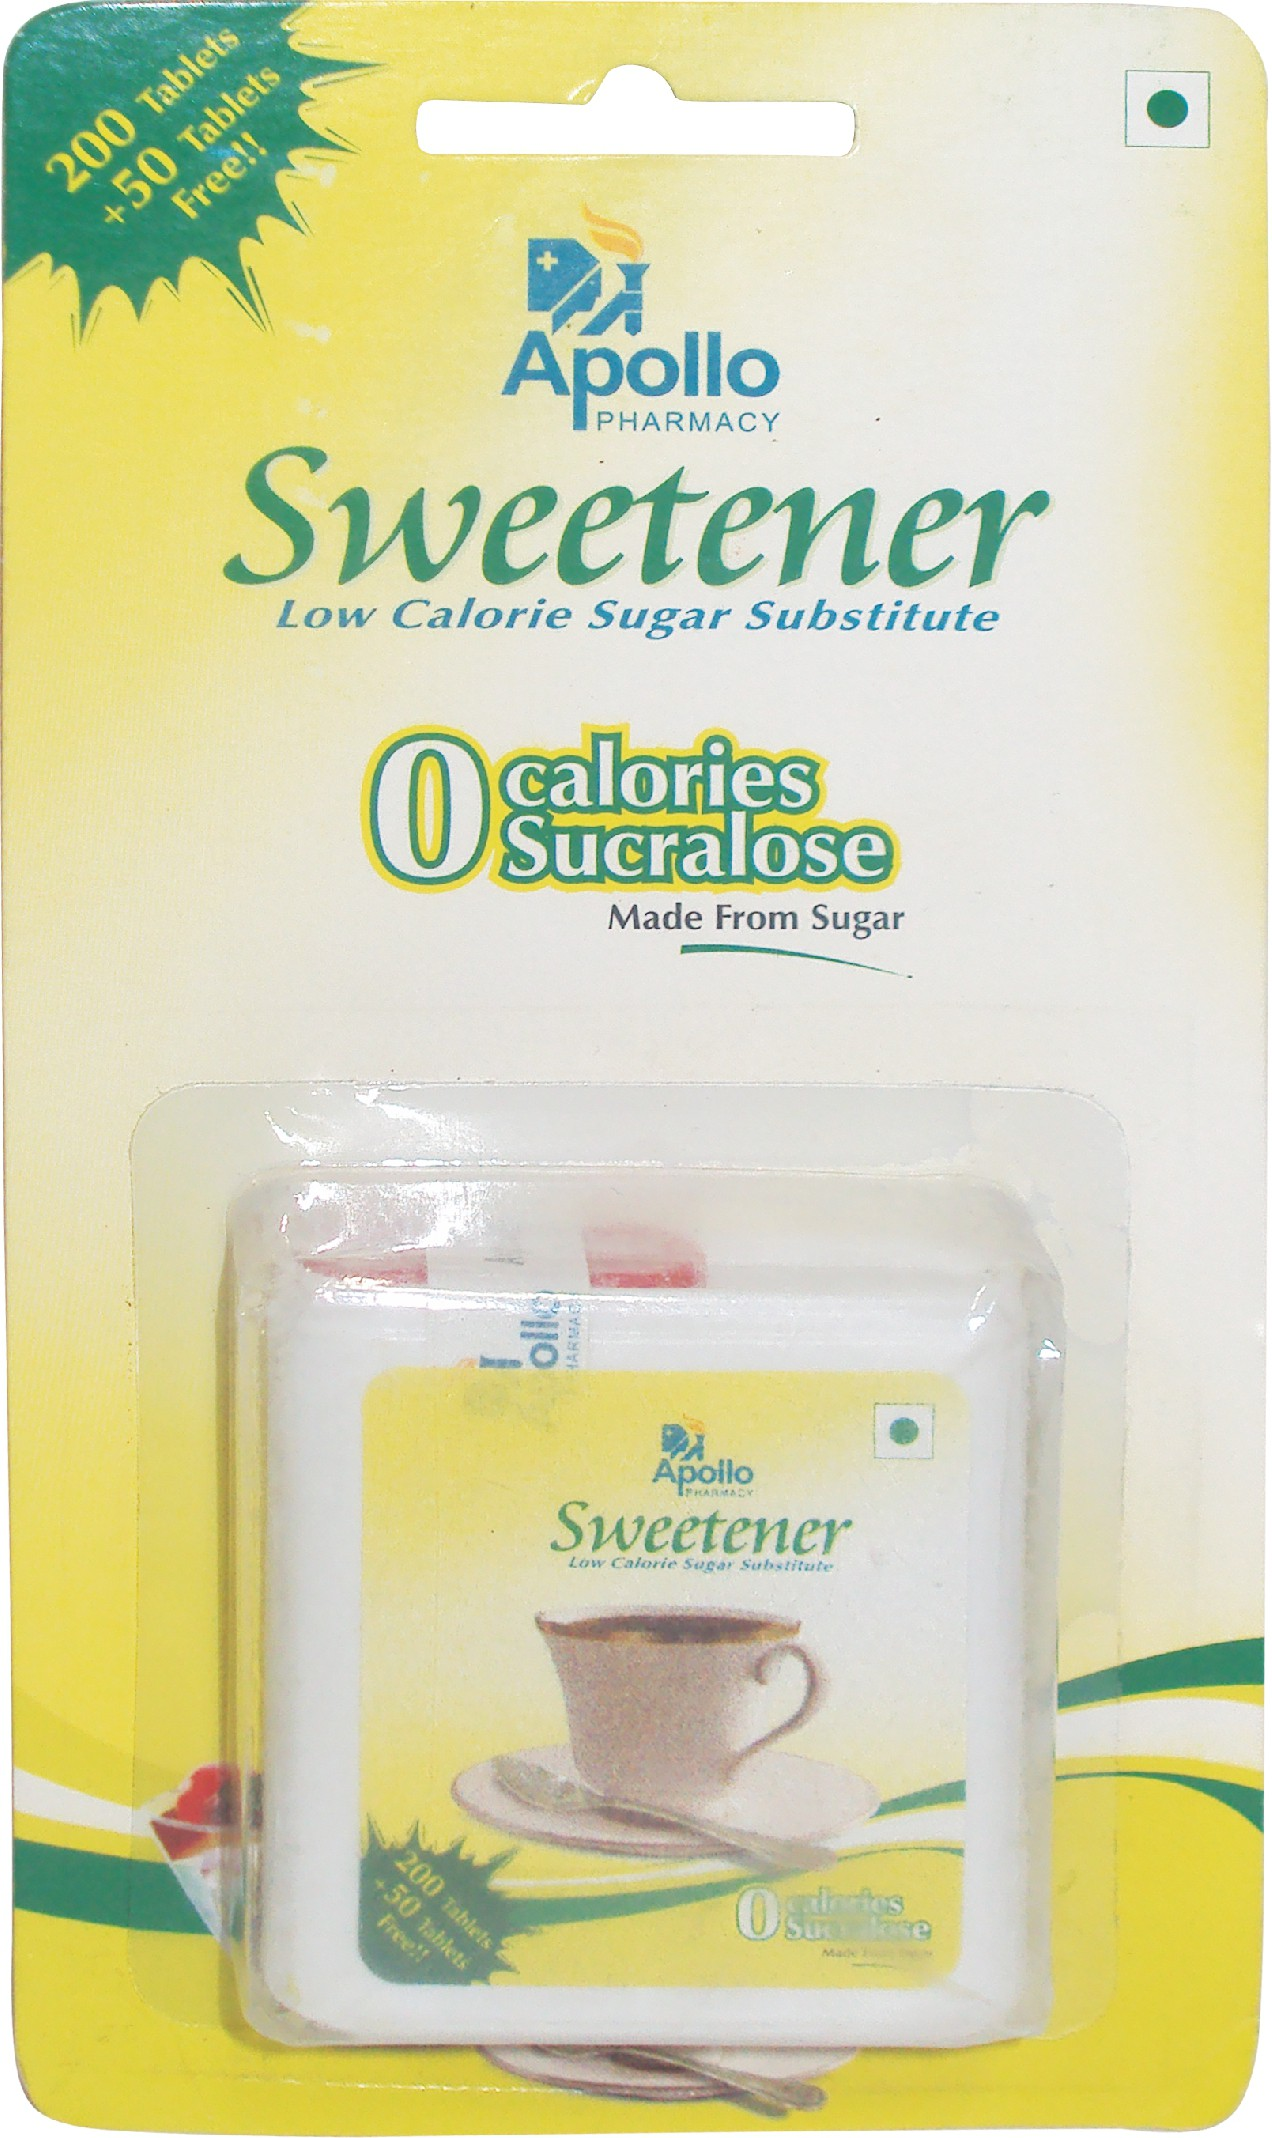 Apollo Pharmacy Sweetener Tablets Sugar